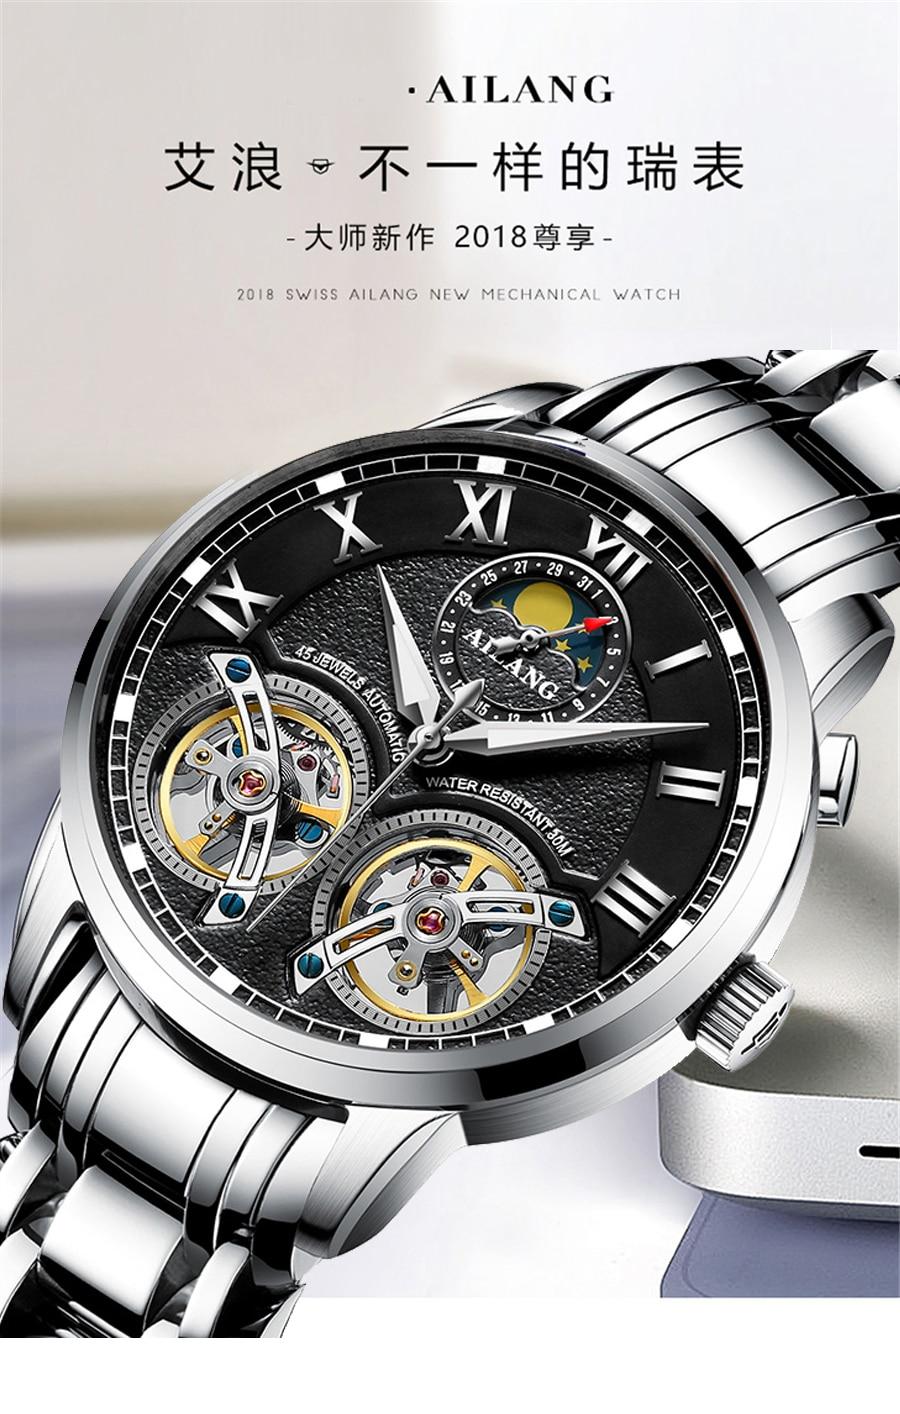 6710e0903242 AILANG Double Tourbillon Mens Watches Top Brand Luxury Automatic Mechanical  Watch Man Waterproof stainless steel Men Wristwatch